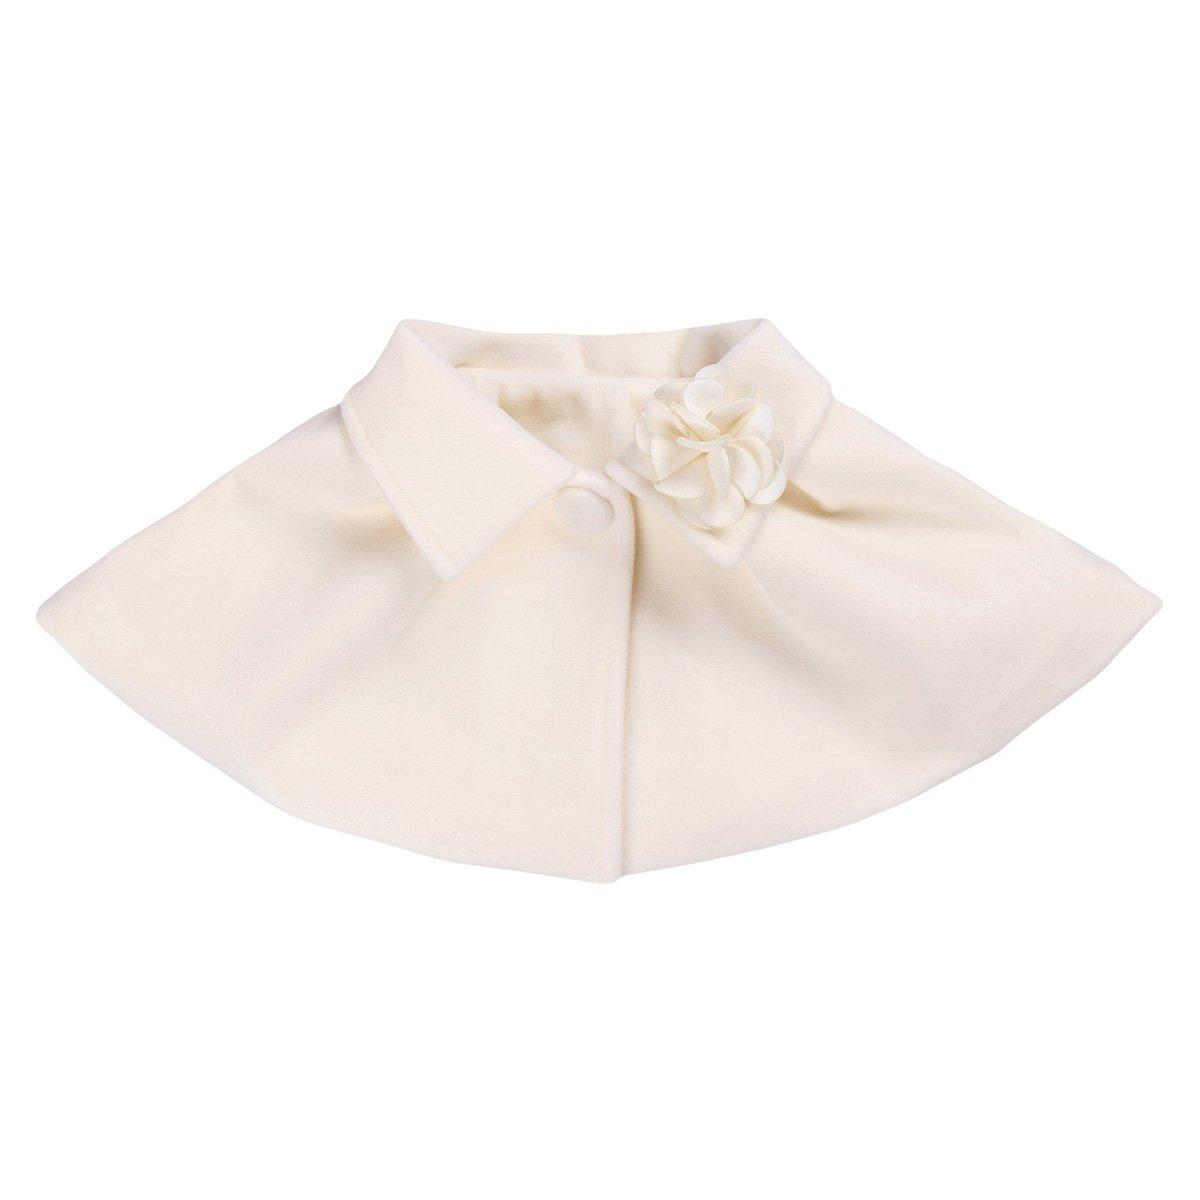 iEFiEL Little Girls Flower Bolero Shrug Shoulder Cover up Cape Short Coat Cream 24 Months